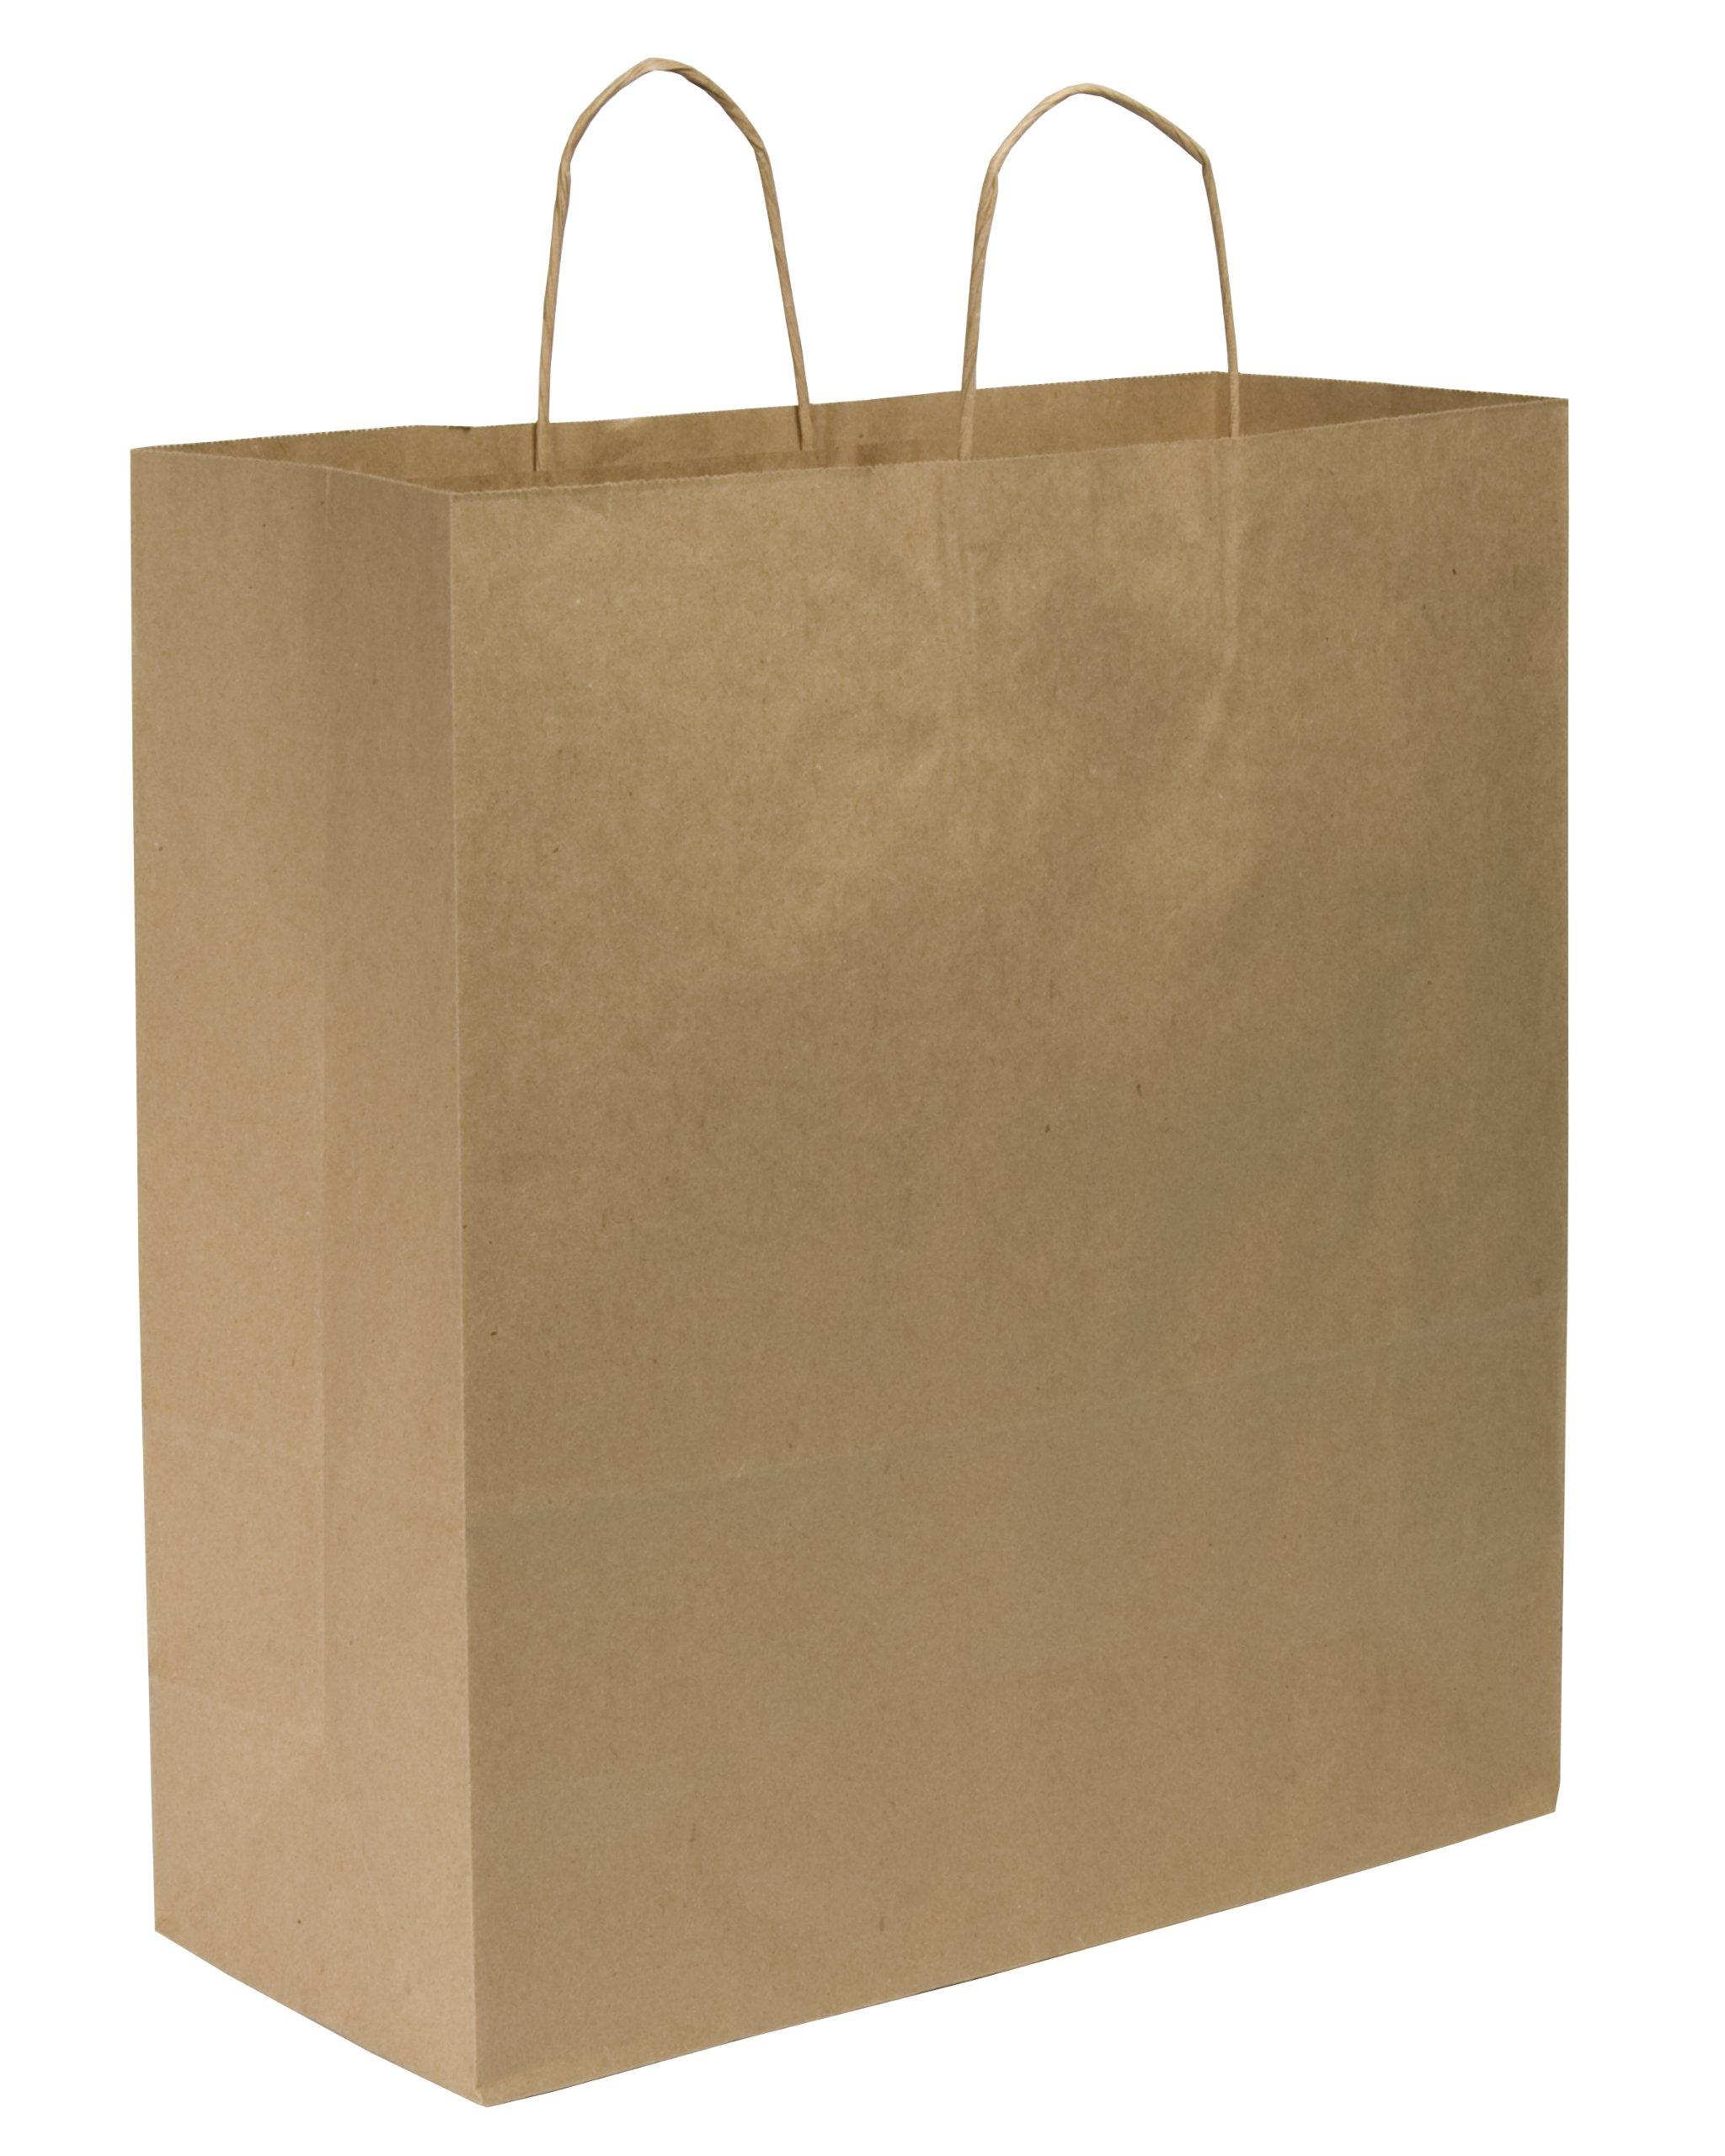 Duro ID# 87148 Cargo Shopping Bag 70# 100% Recycled Natural Kraft 200pk 18 x 7 x 18-3/4